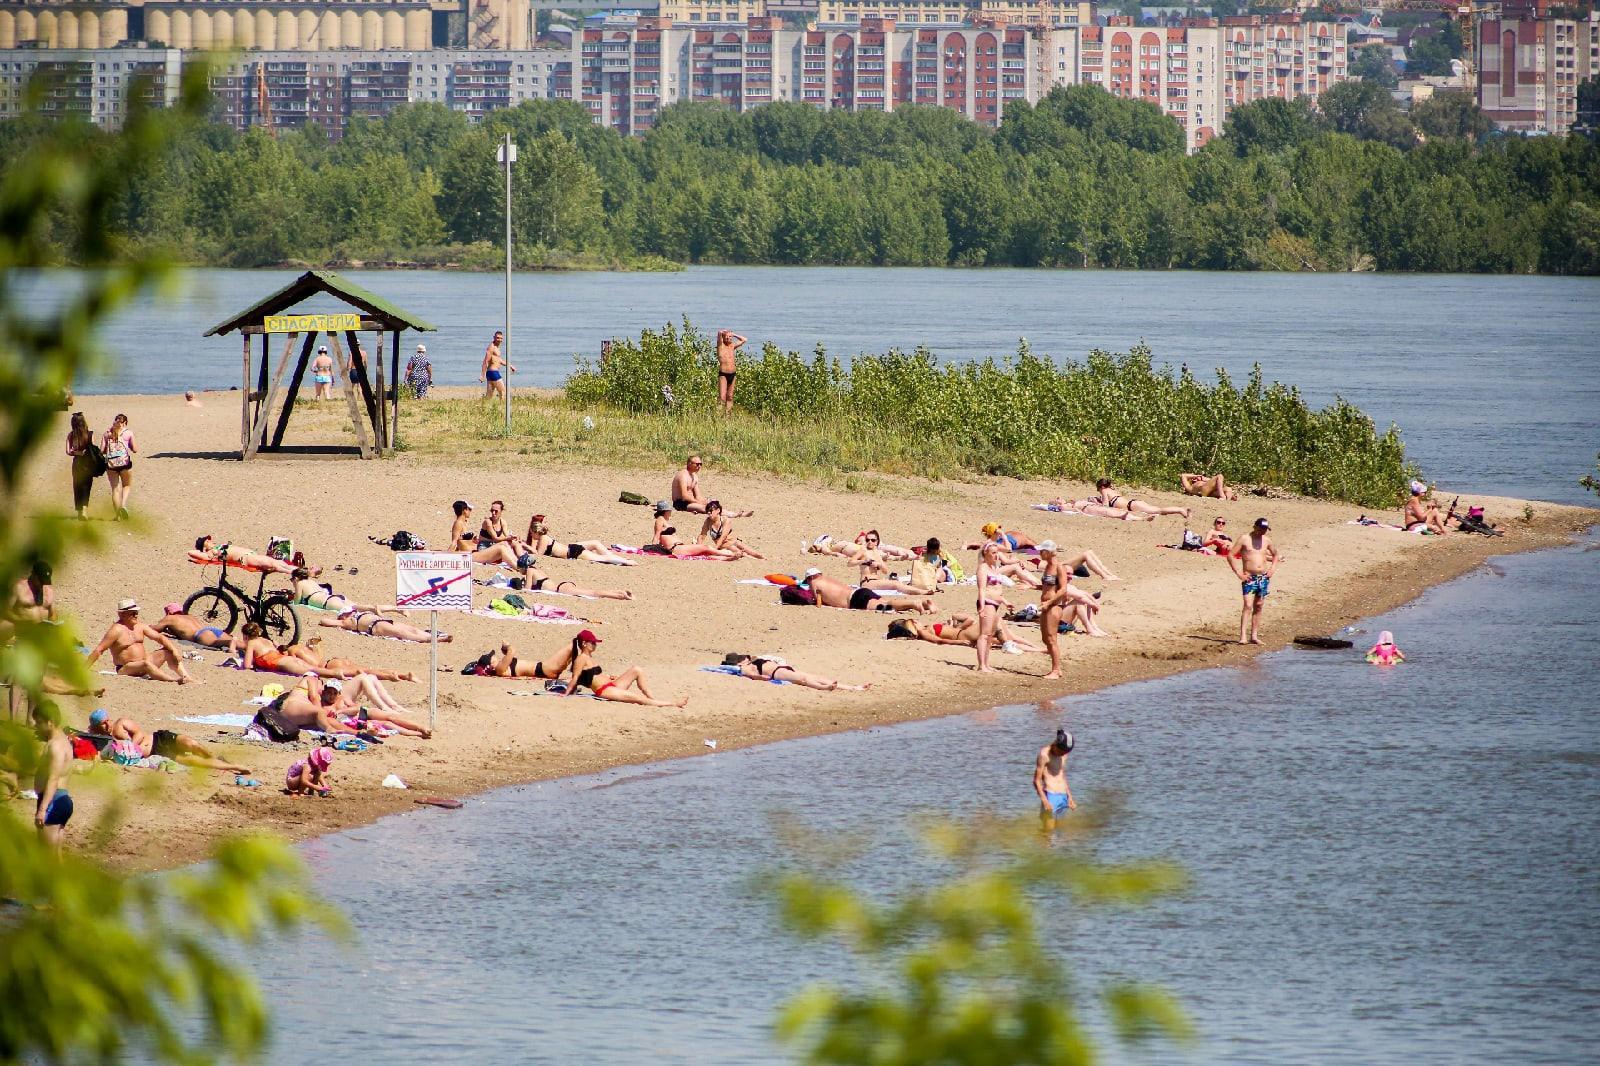 фото Бикини, селфи и горячий песок: 10 жарких фото с Бугринского пляжа в Новосибирске 2